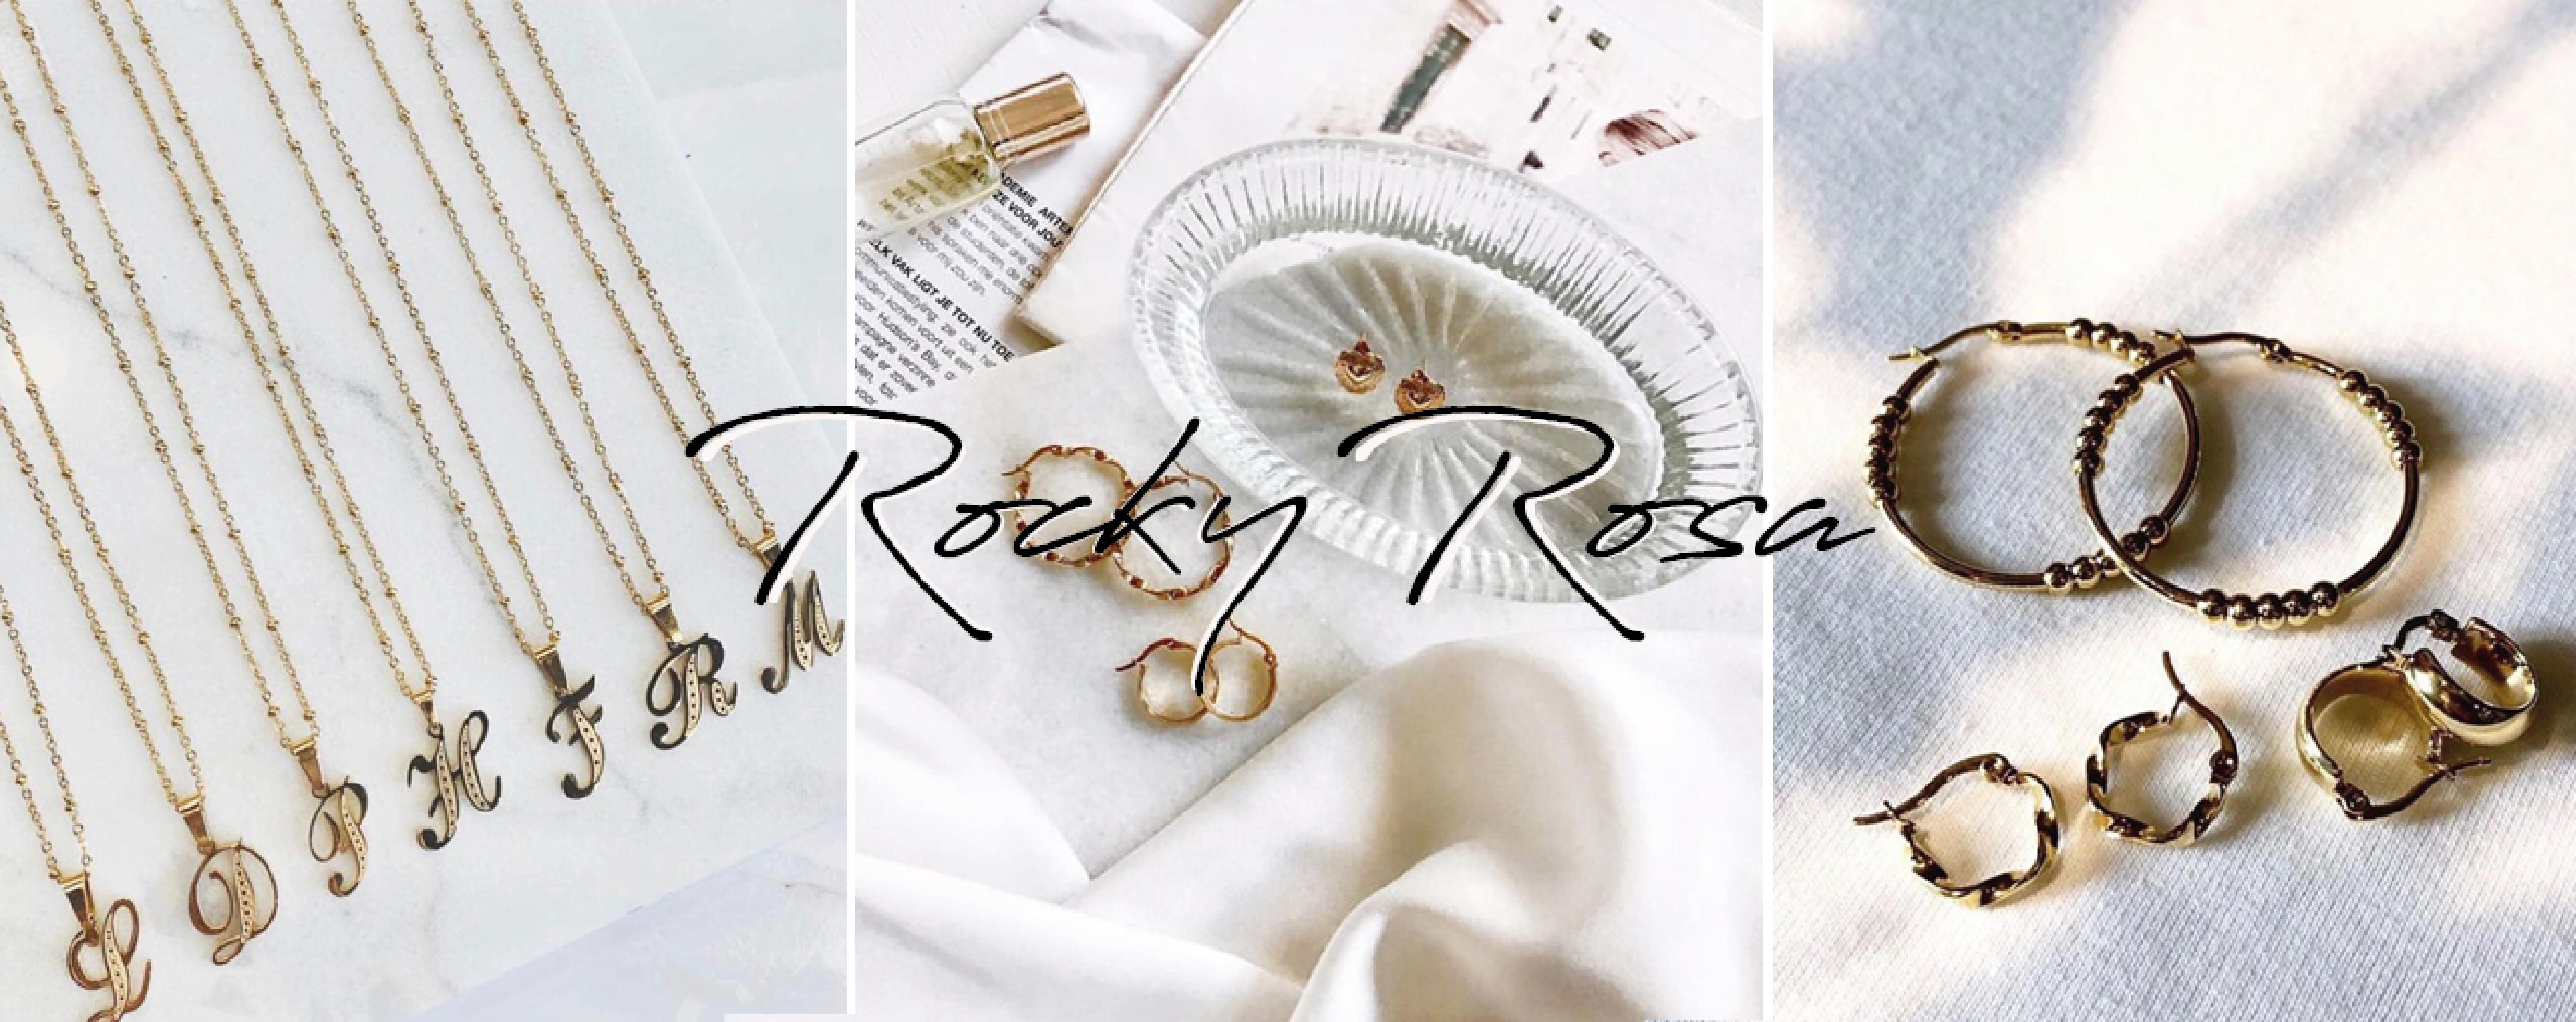 Rocky Rosa pagina banner